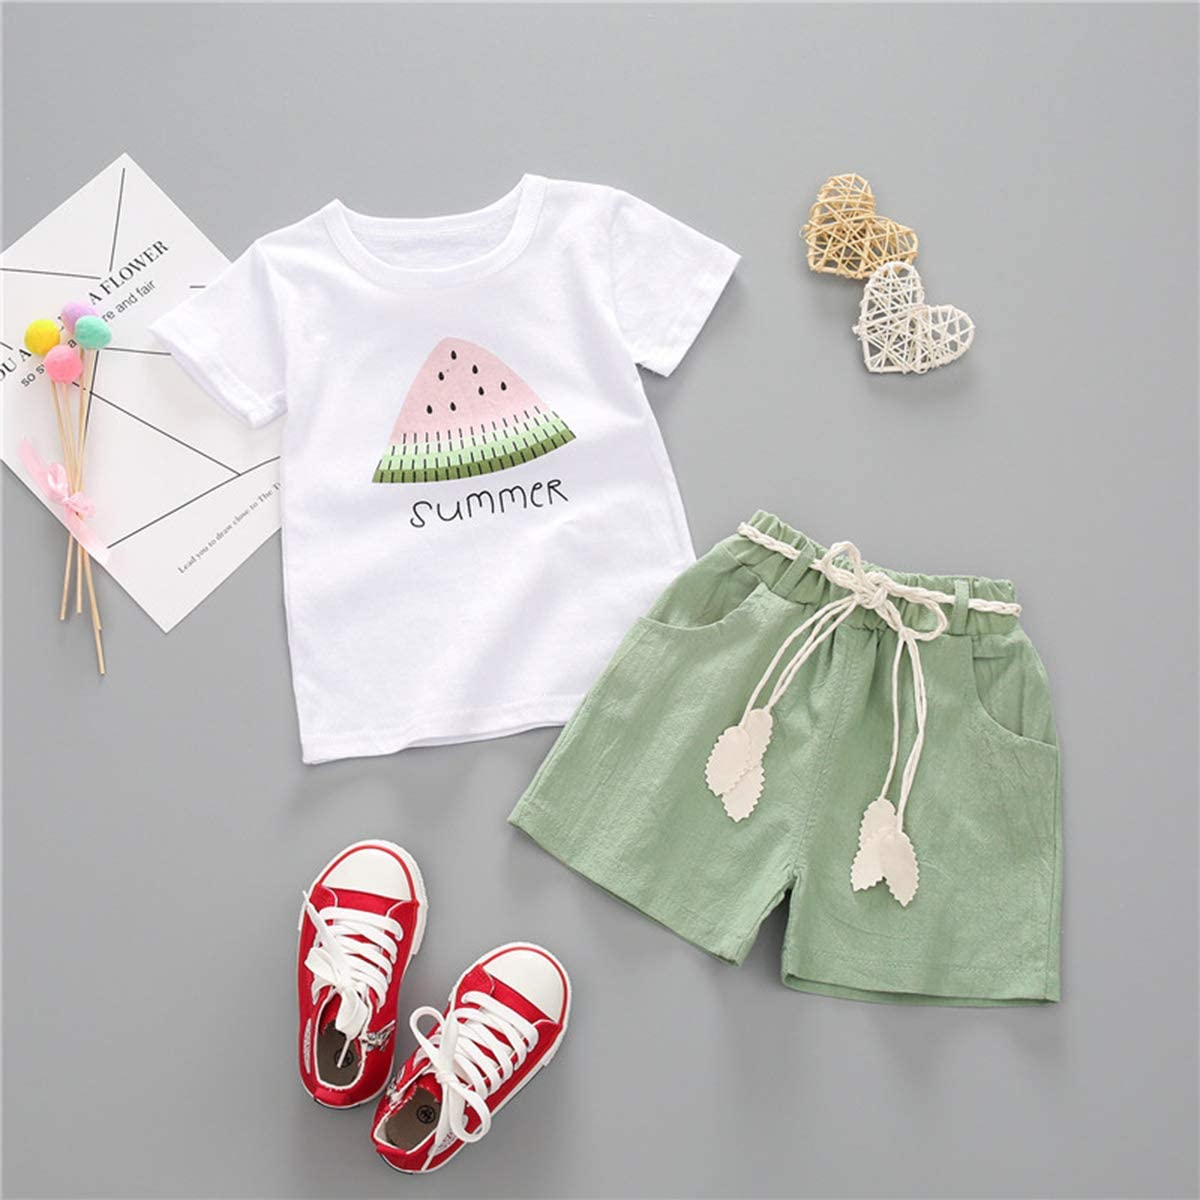 YOUNGER TREE Toddler Baby Girls Clothes Watermelon T-Shirt Linen Shorts with Belt Cute Summer Short Set